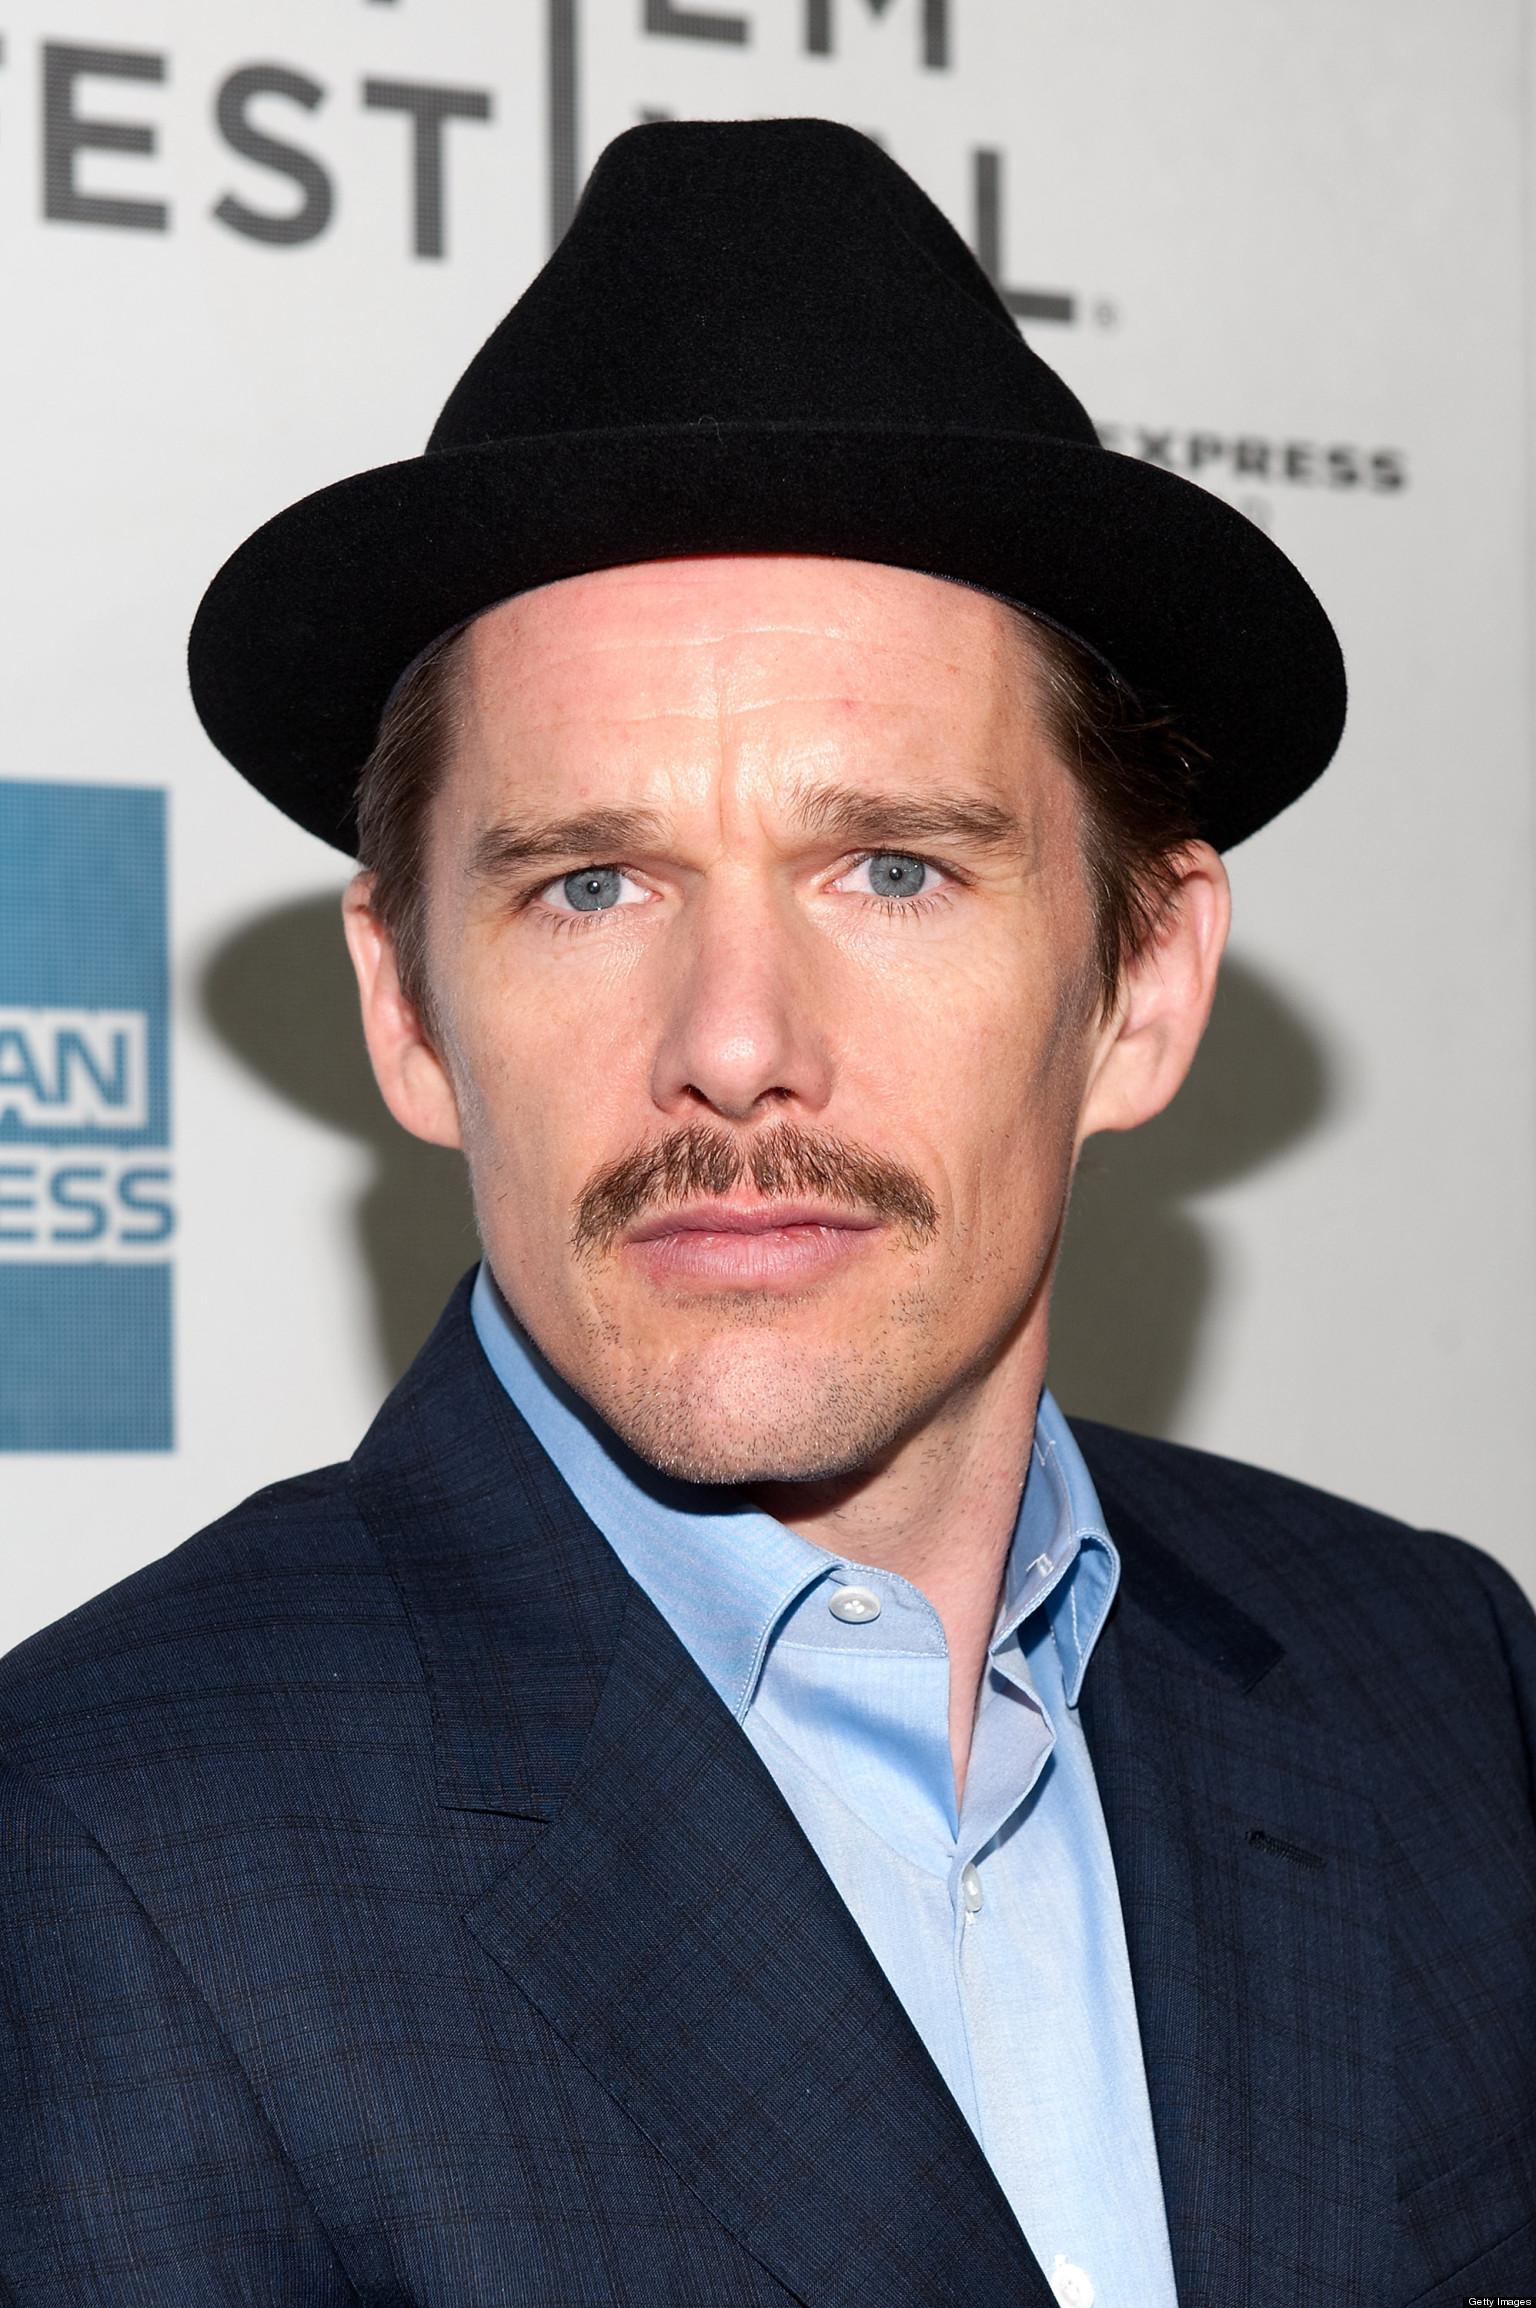 Ethan-Hawke Итан Хоук 44 года усы